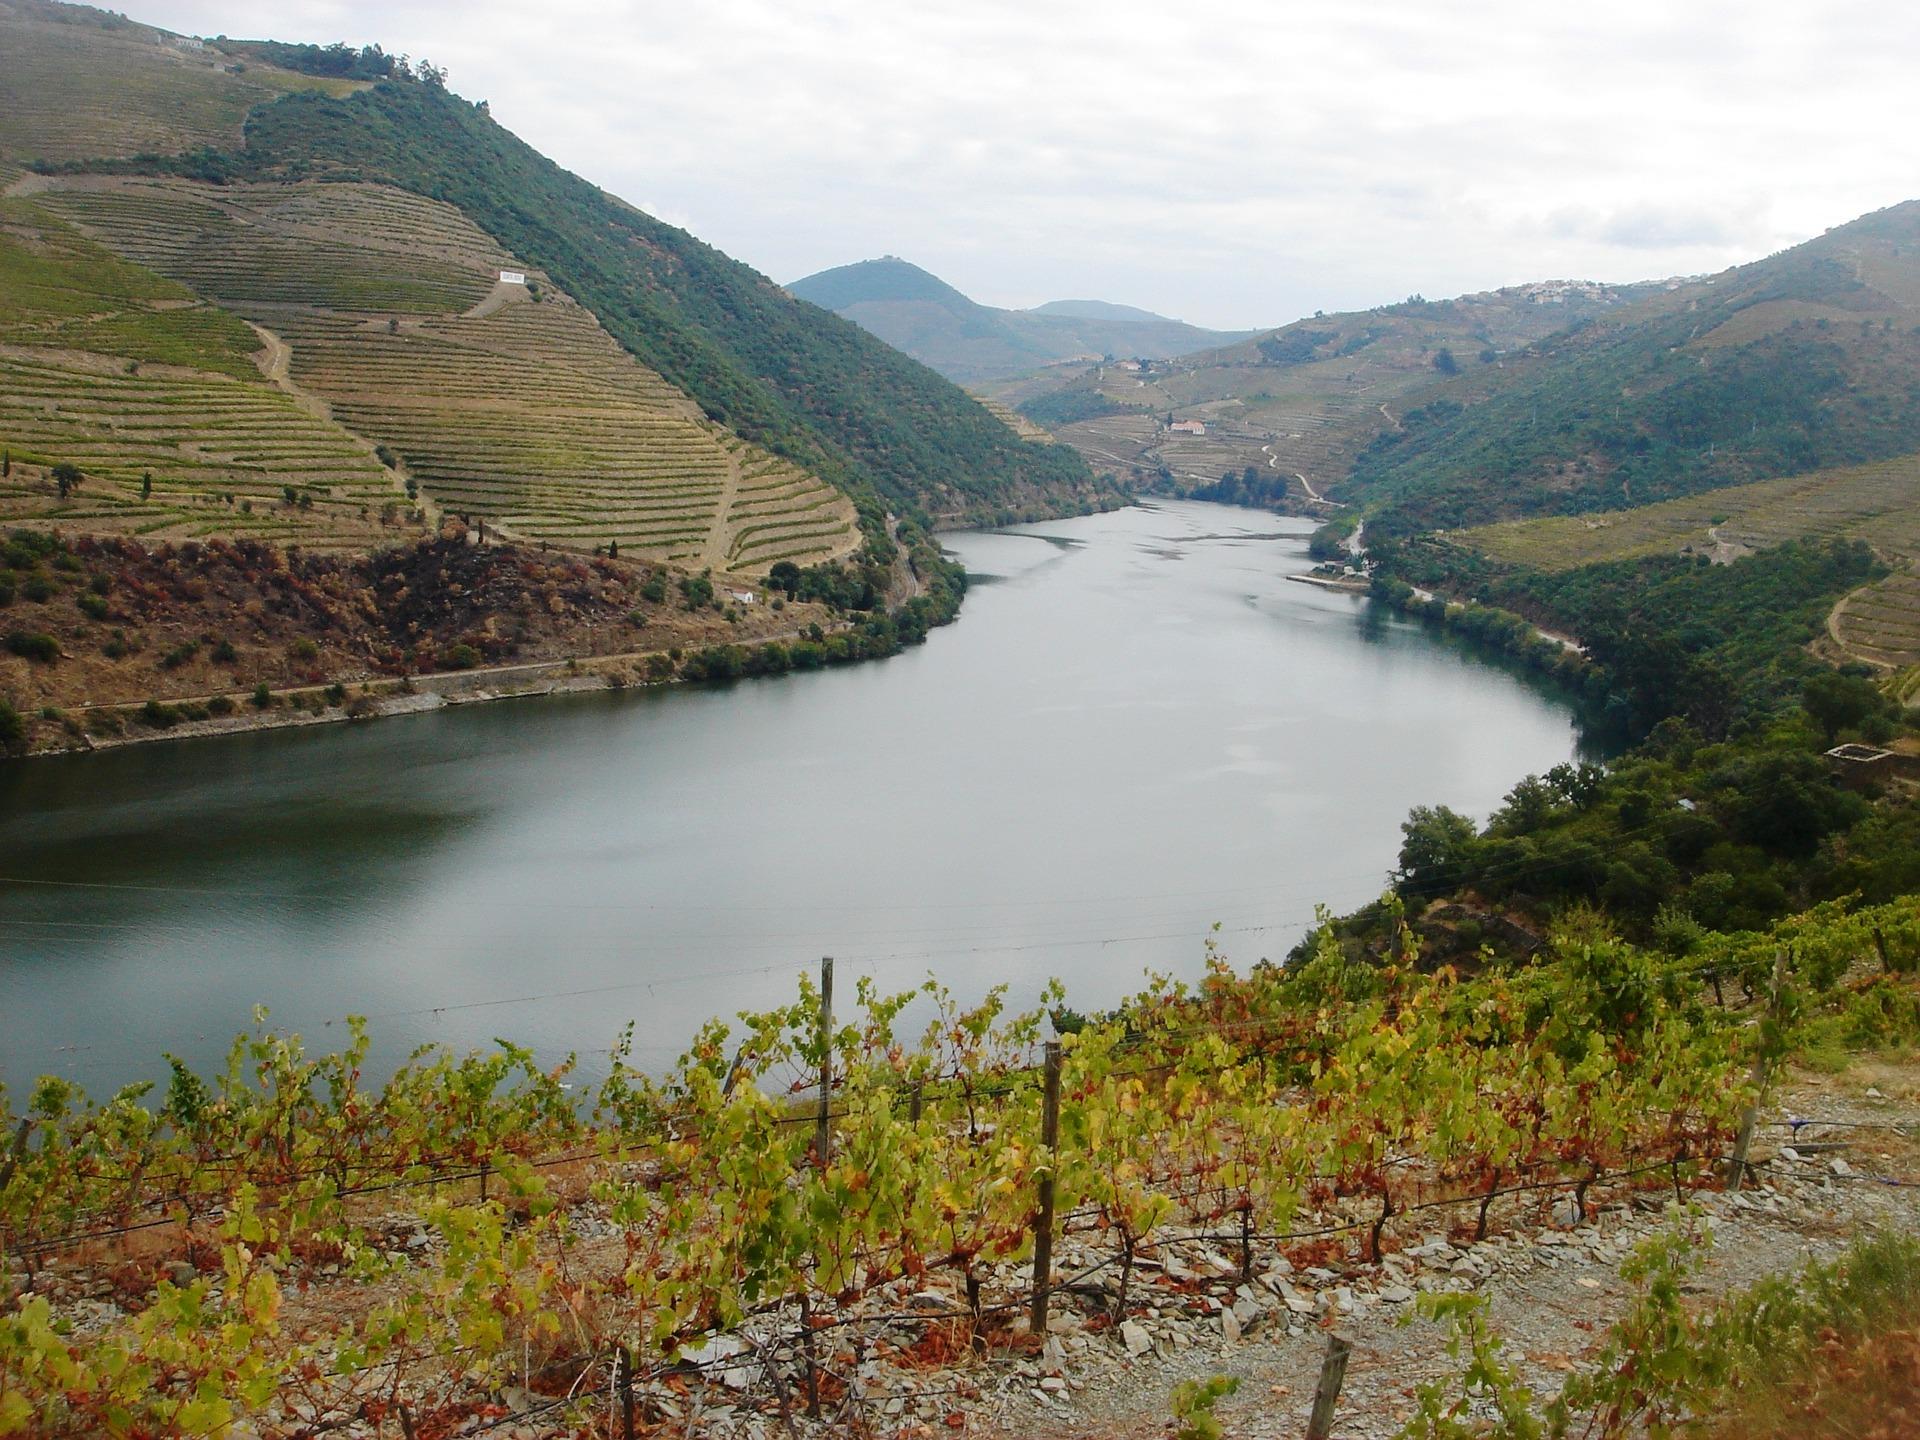 river-douro-838765_1920.jpg